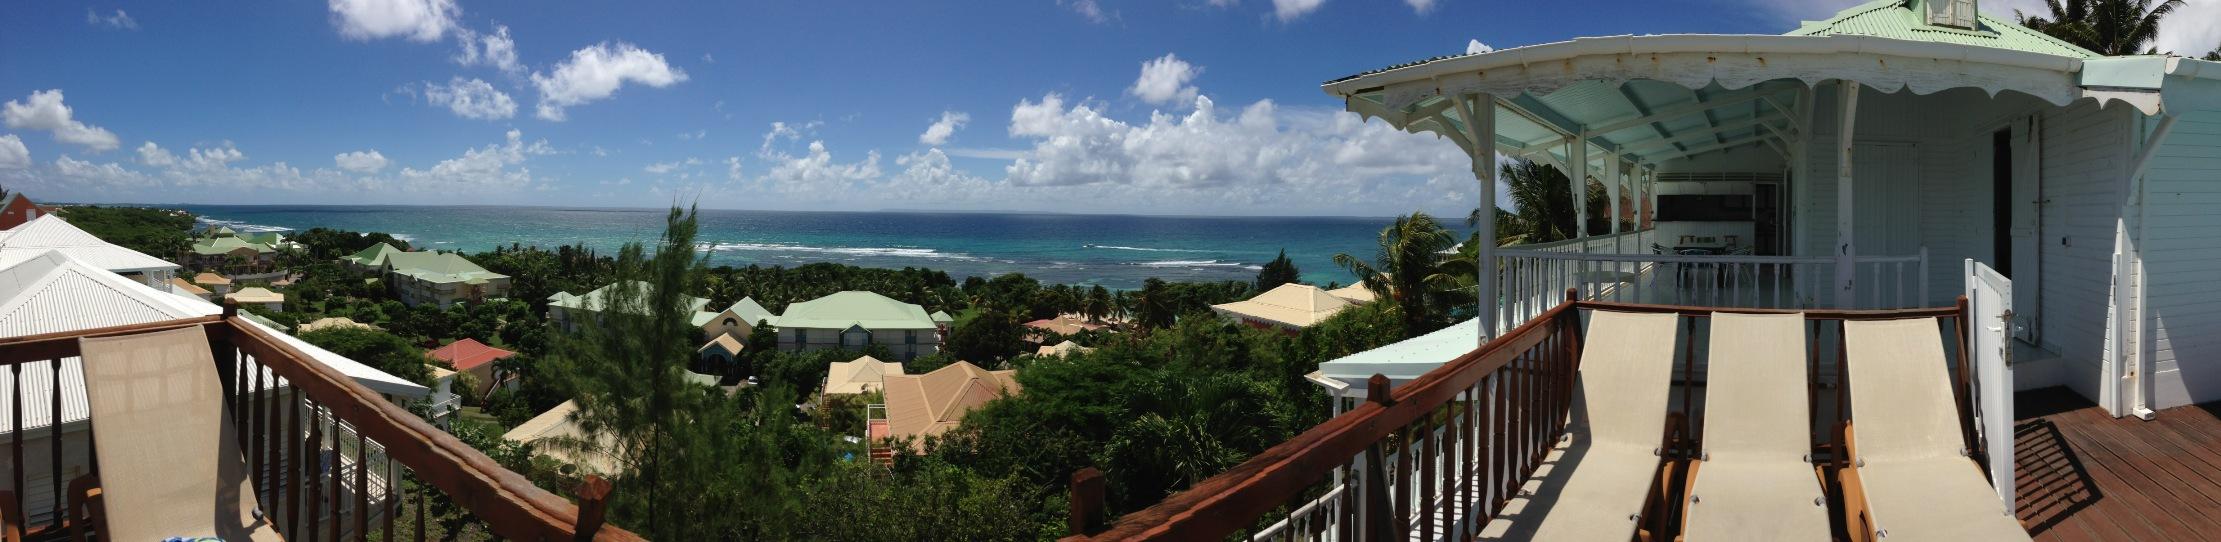 vue de la residence du lagon